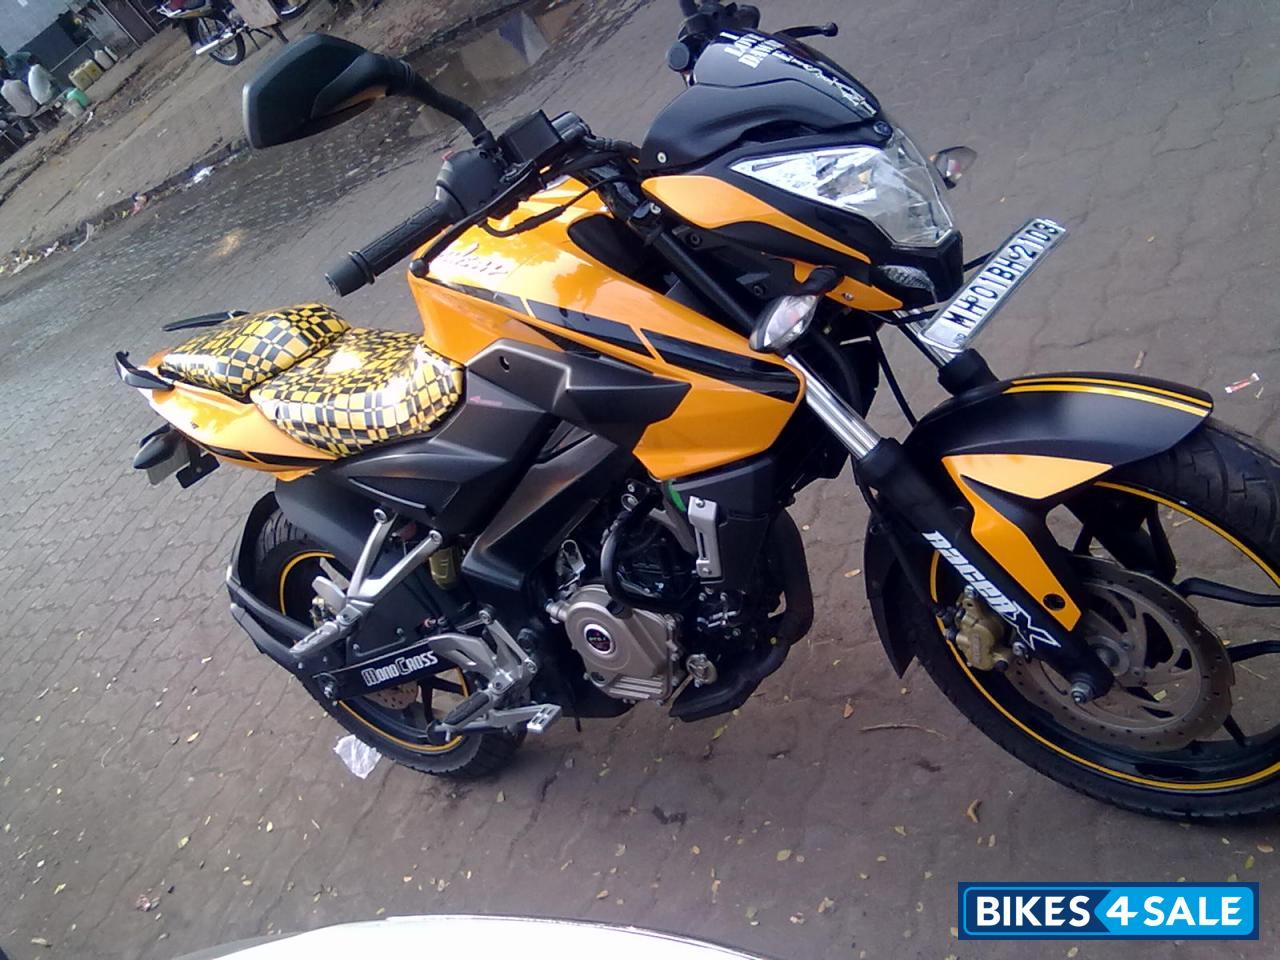 Bajaj pulsar 200 ns picture 5 album id is 96816 bike located in